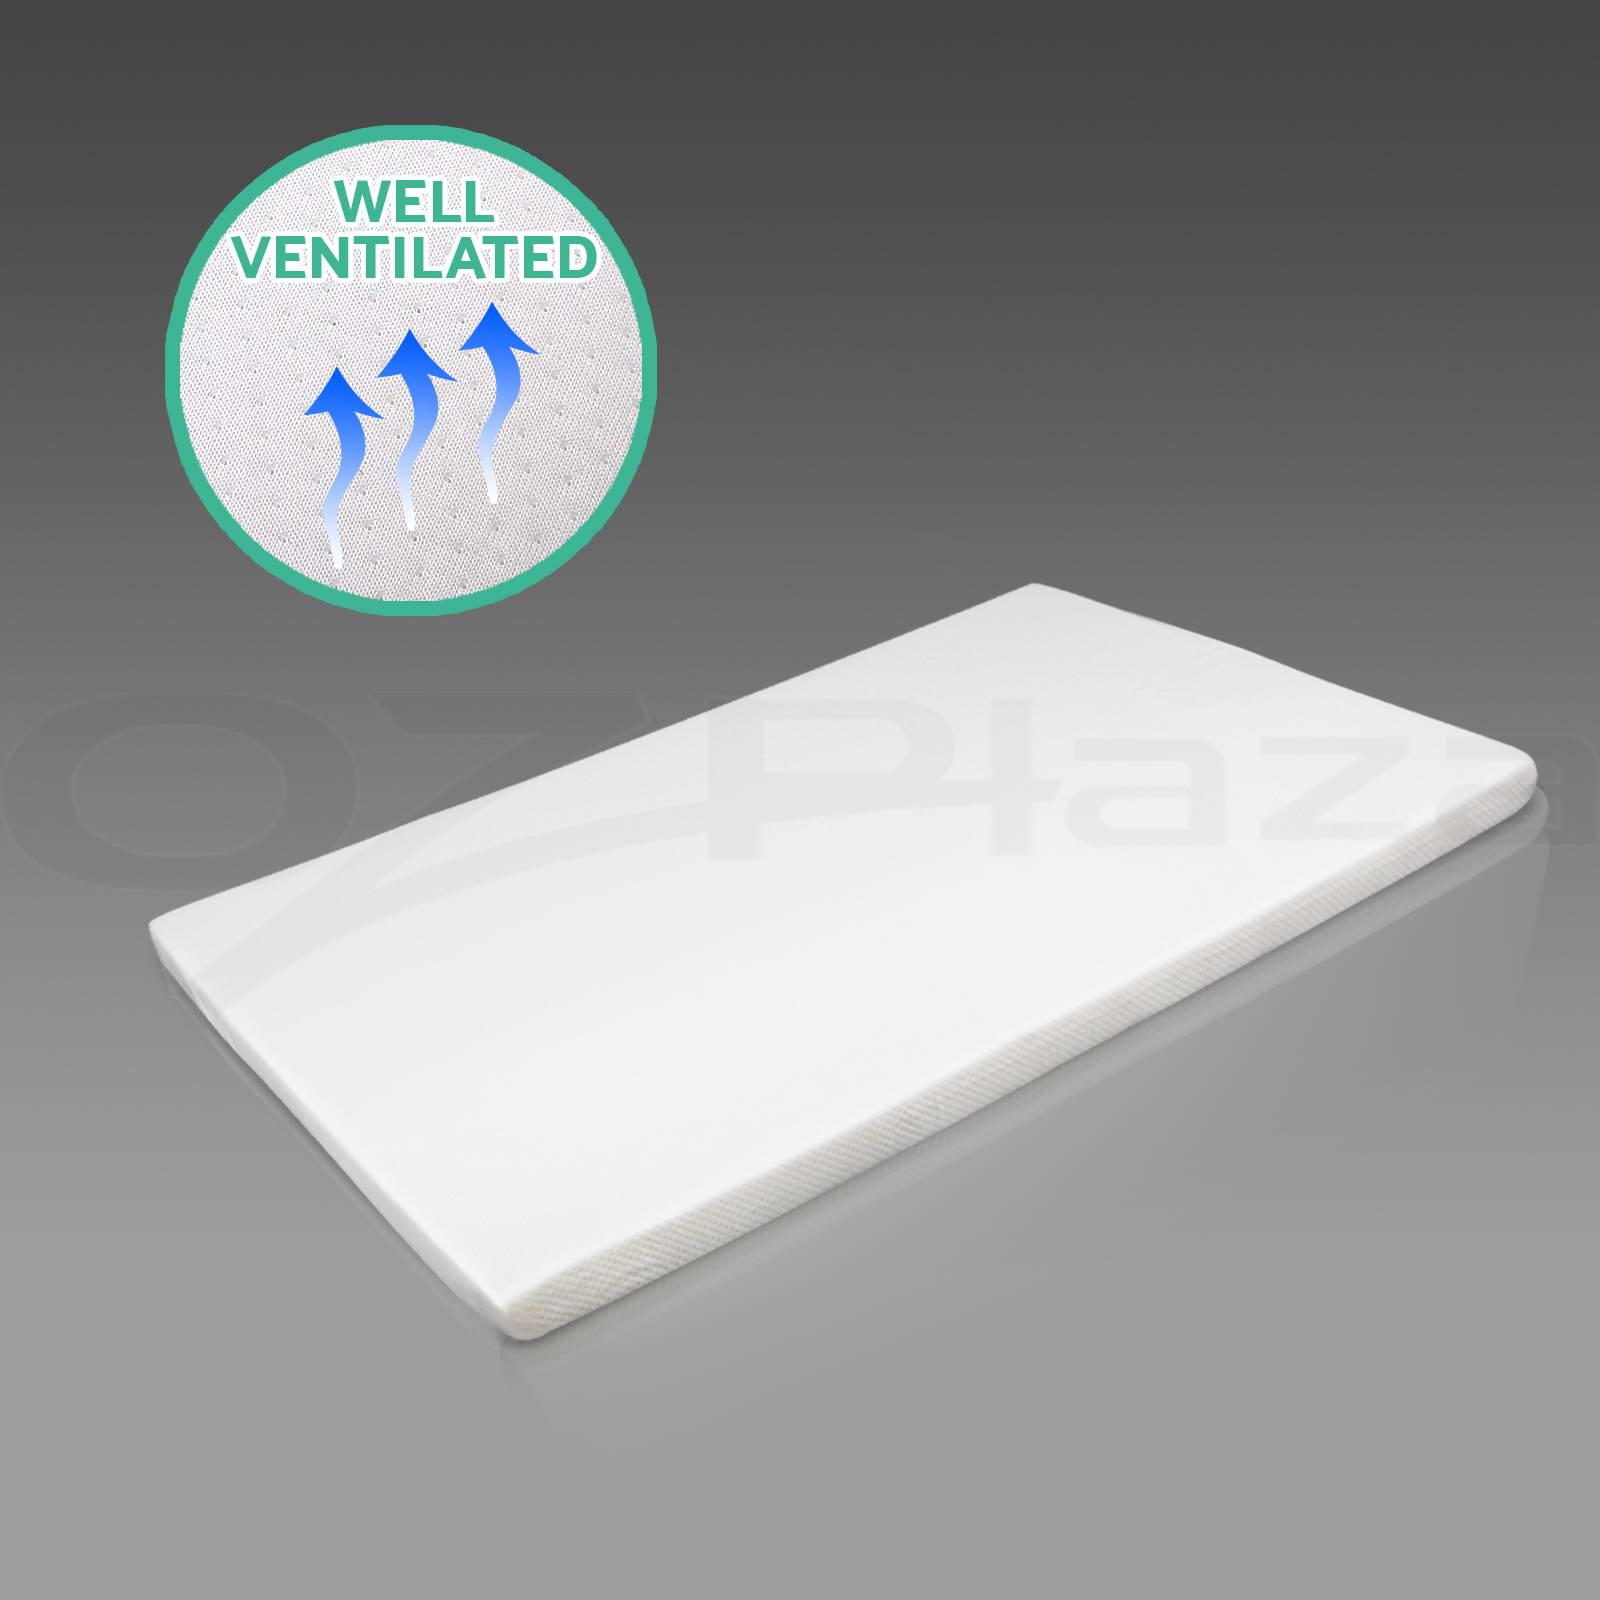 memory foam mattress topper single size 5cm visco bed. Black Bedroom Furniture Sets. Home Design Ideas